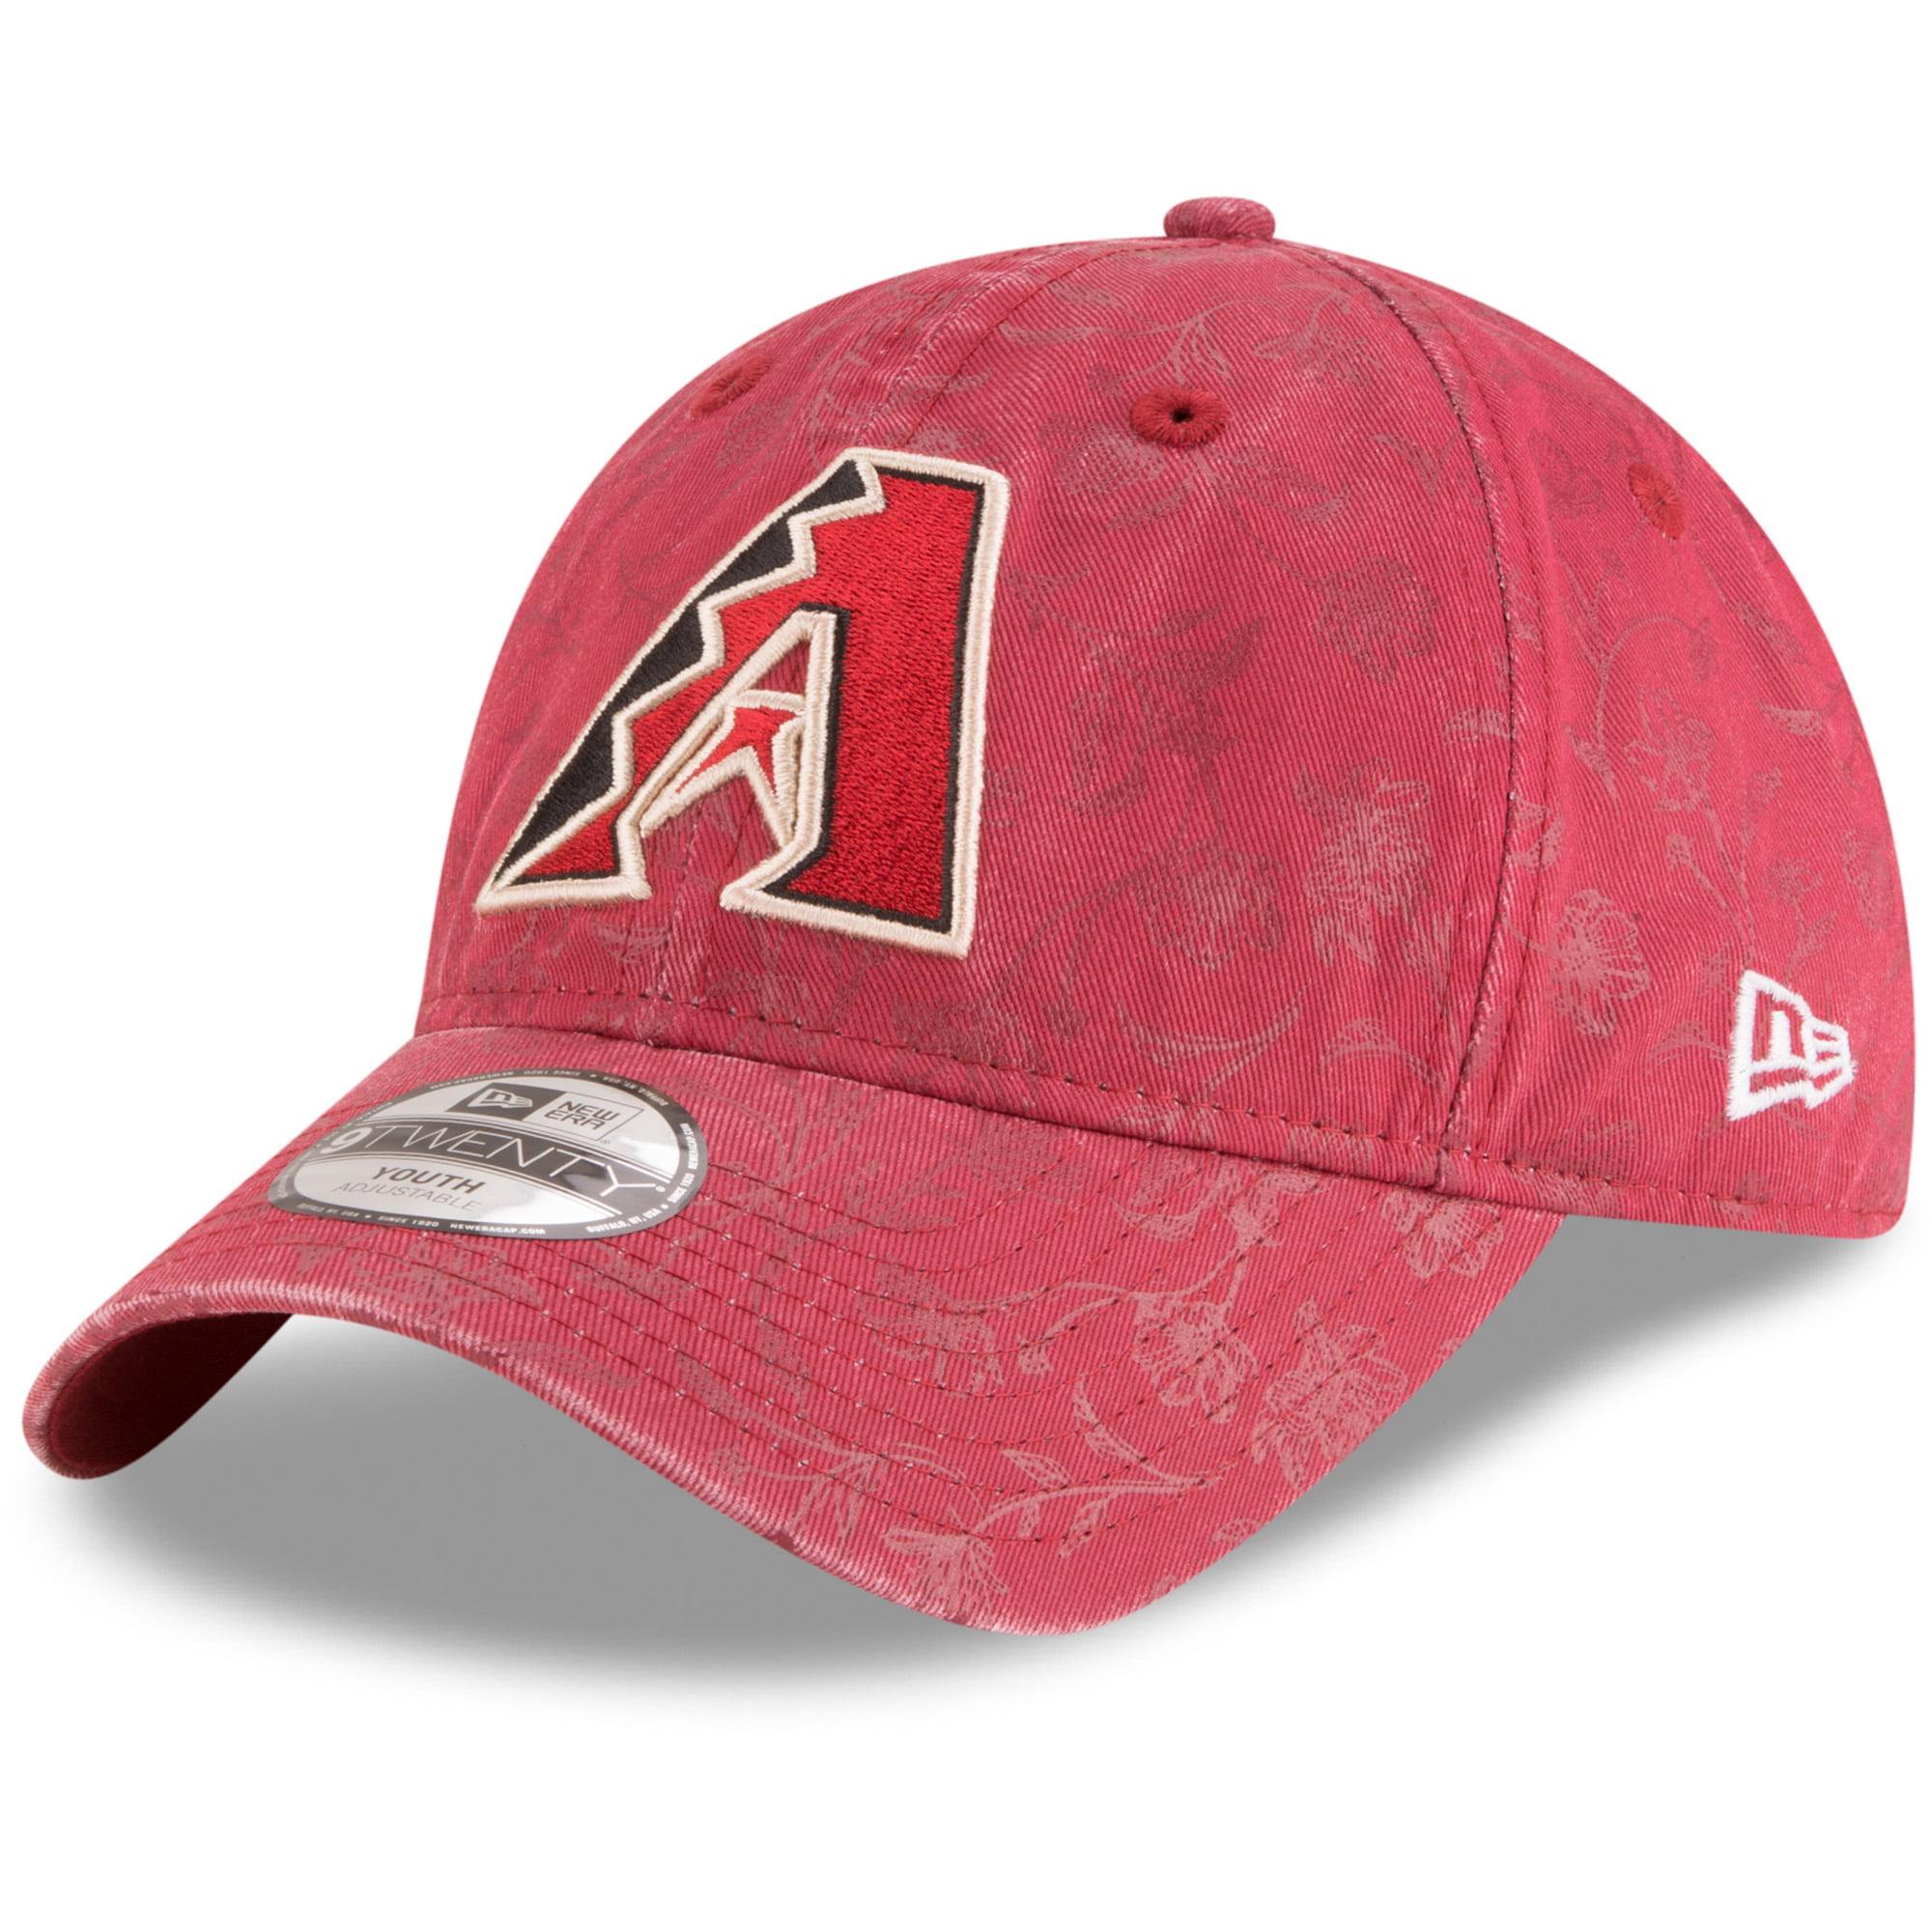 Arizona Diamondbacks New Era Girls Youth Floral Peek 9TWENTY Adjustable Hat - Red - OSFA